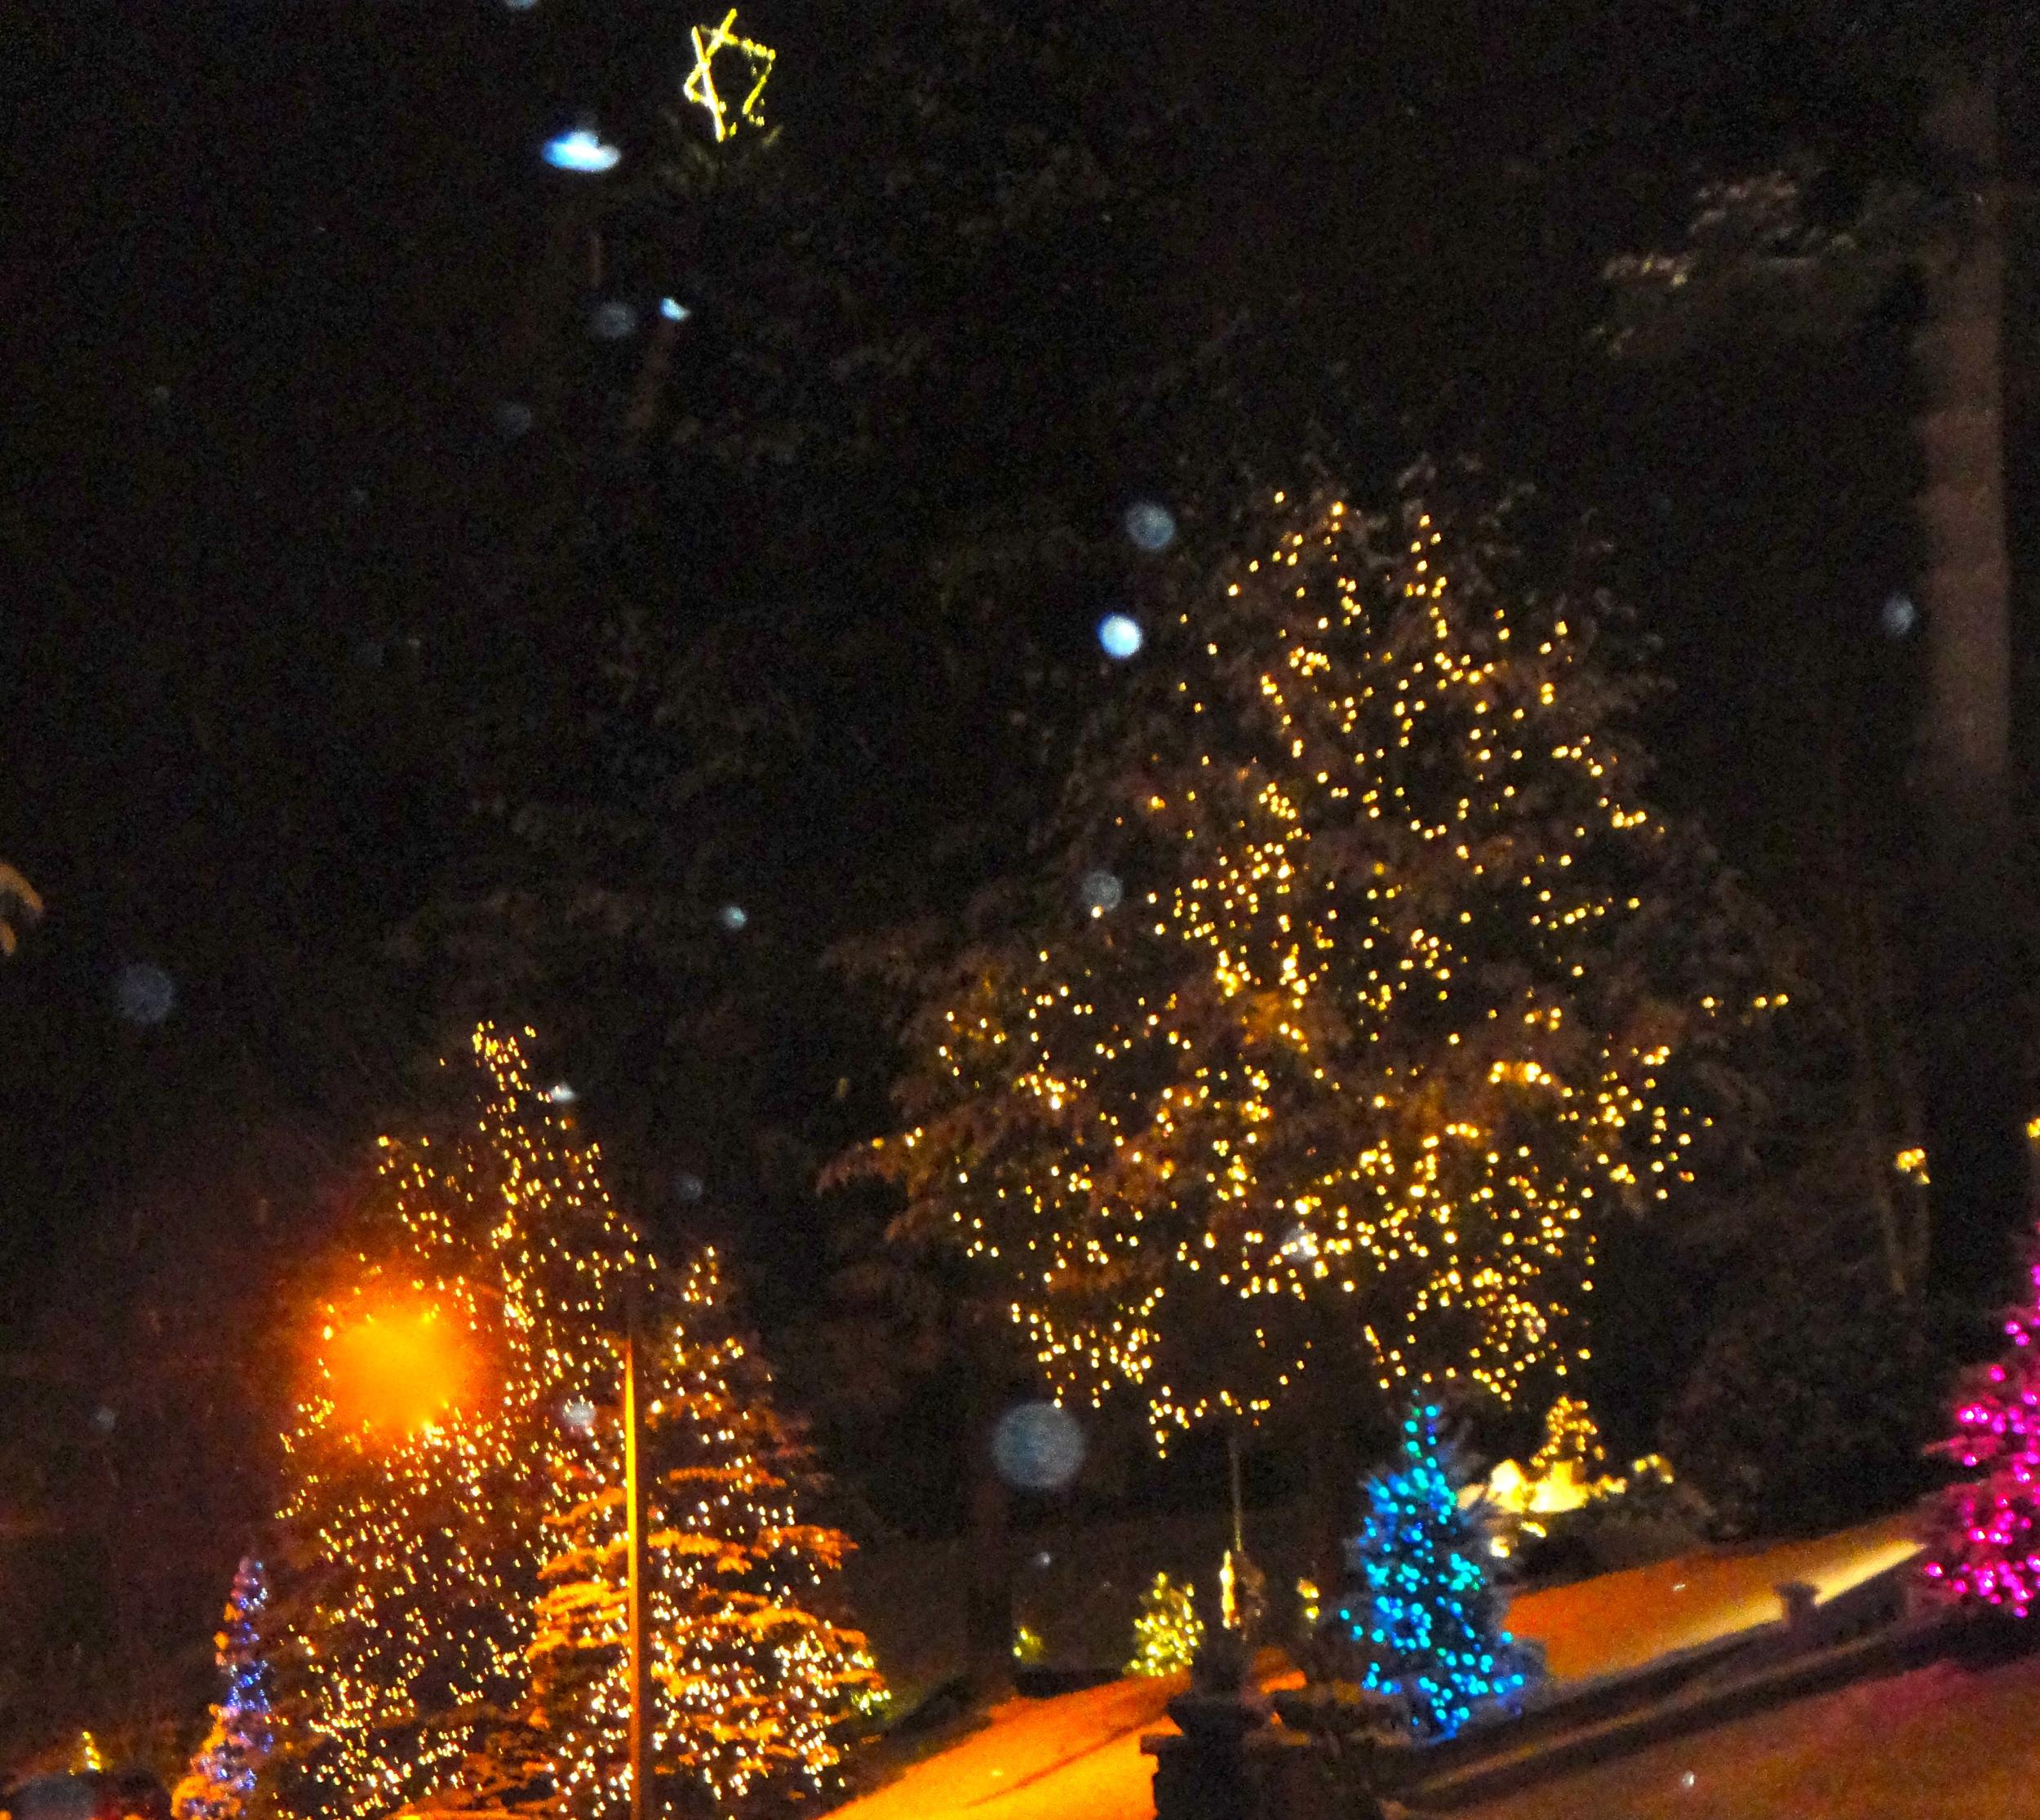 Festive Mirror Lake Inn lights